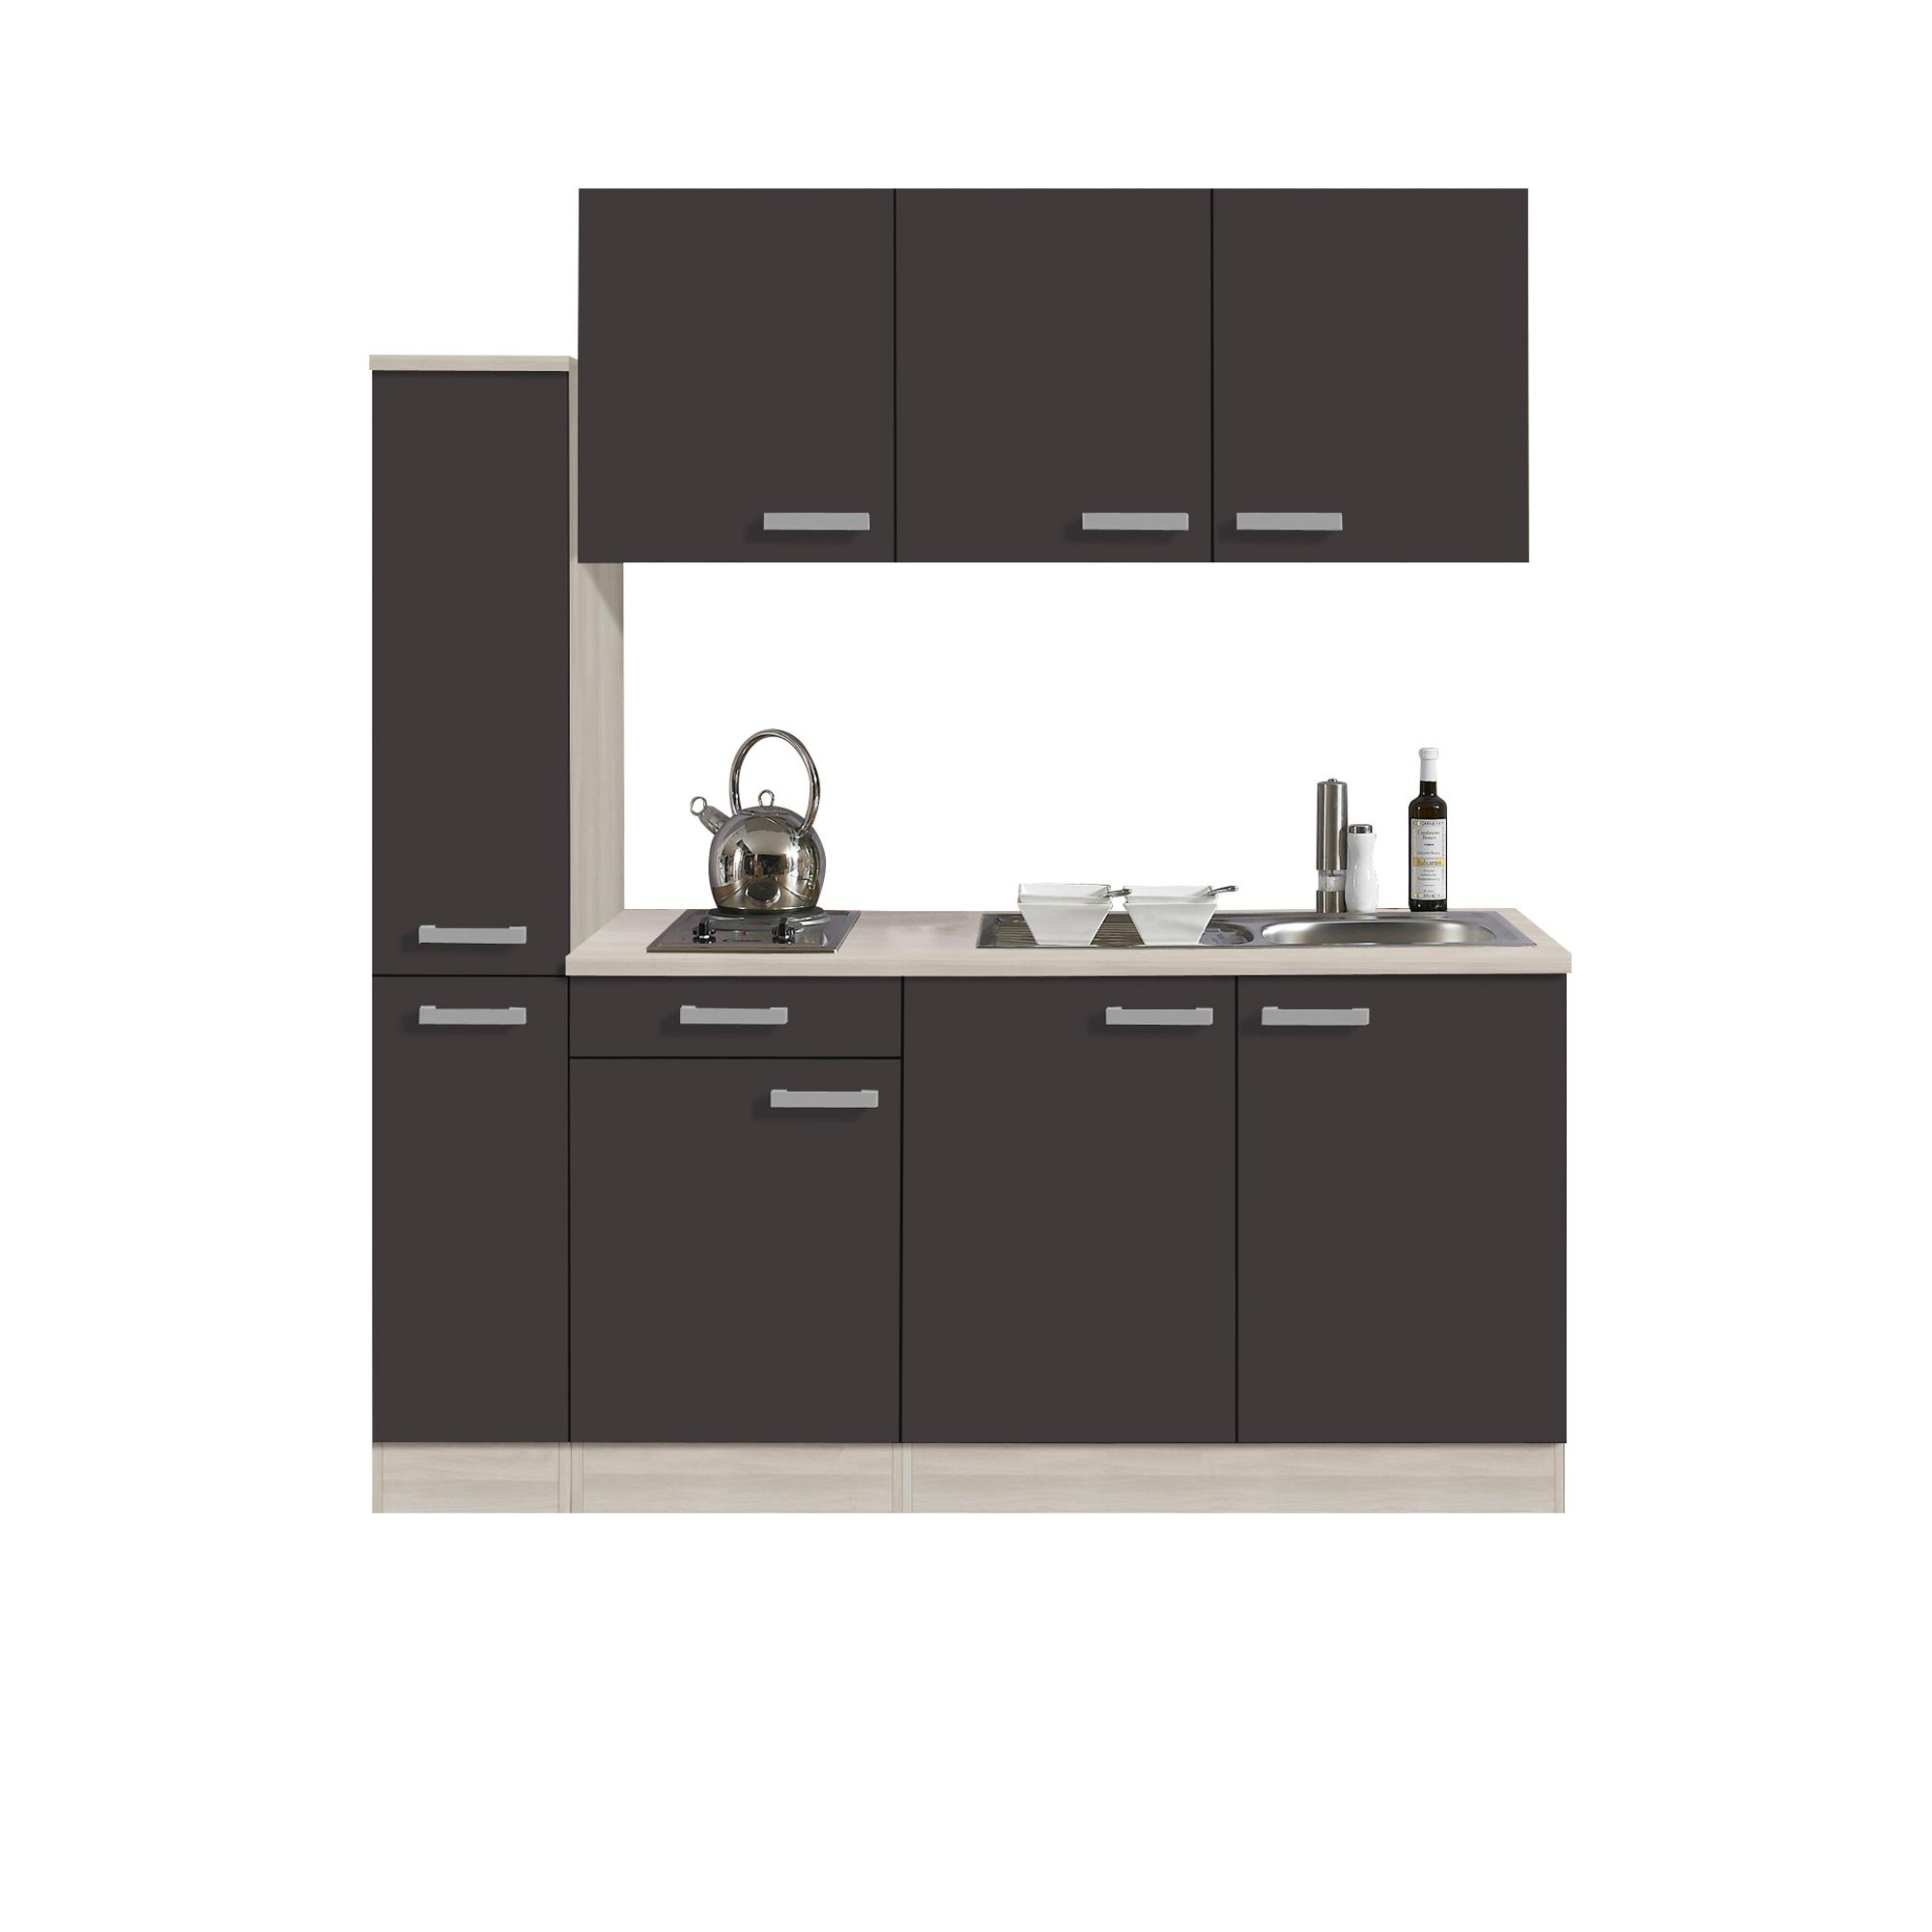 singlek che barcelona mit elektro kochfeld 8 teilig breite 180 cm grau k che singlek chen. Black Bedroom Furniture Sets. Home Design Ideas